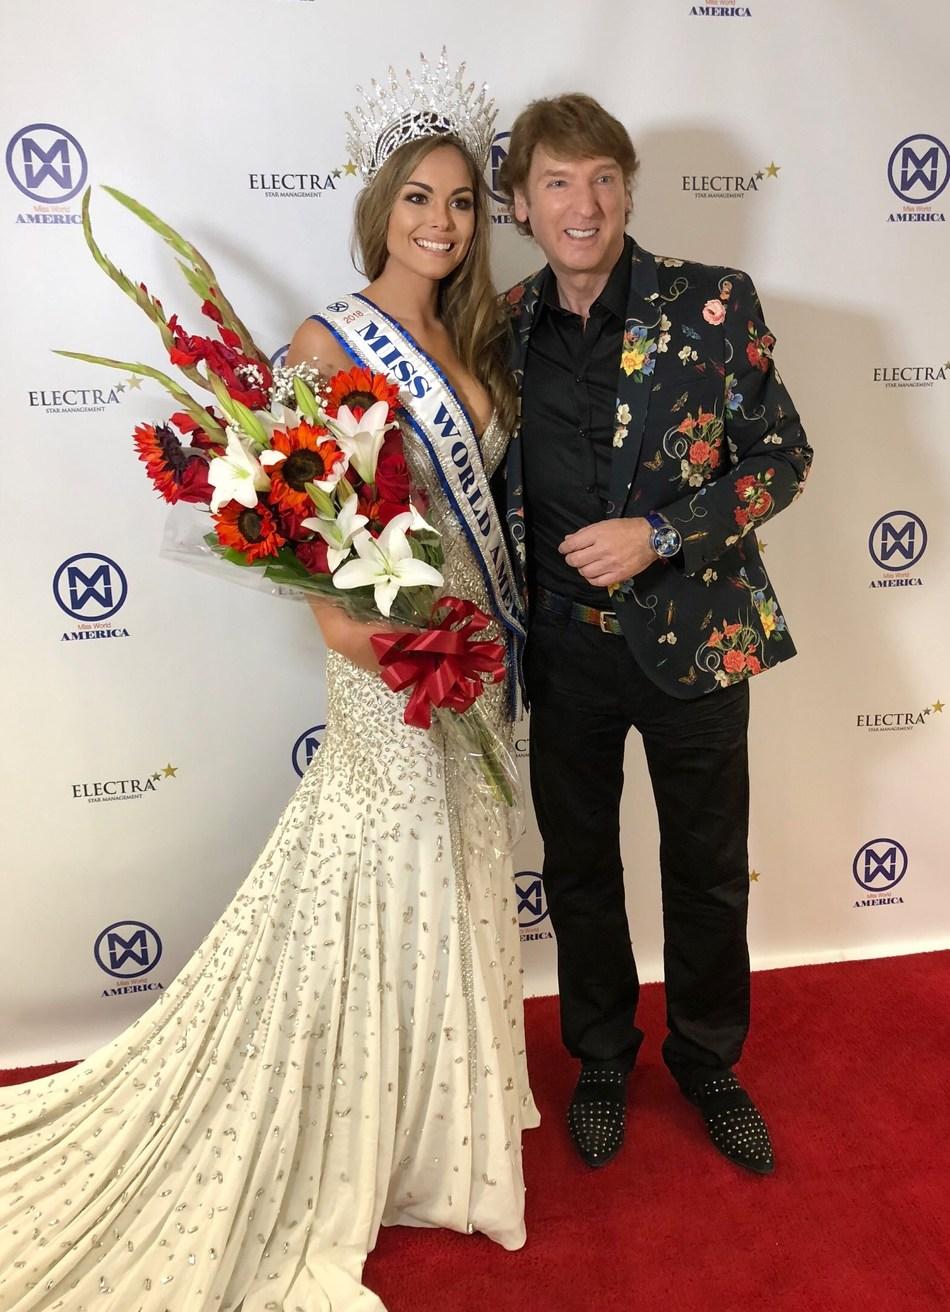 Marisa Butler, Miss World America 2018, and Michael Blakey, Miss World America National Director